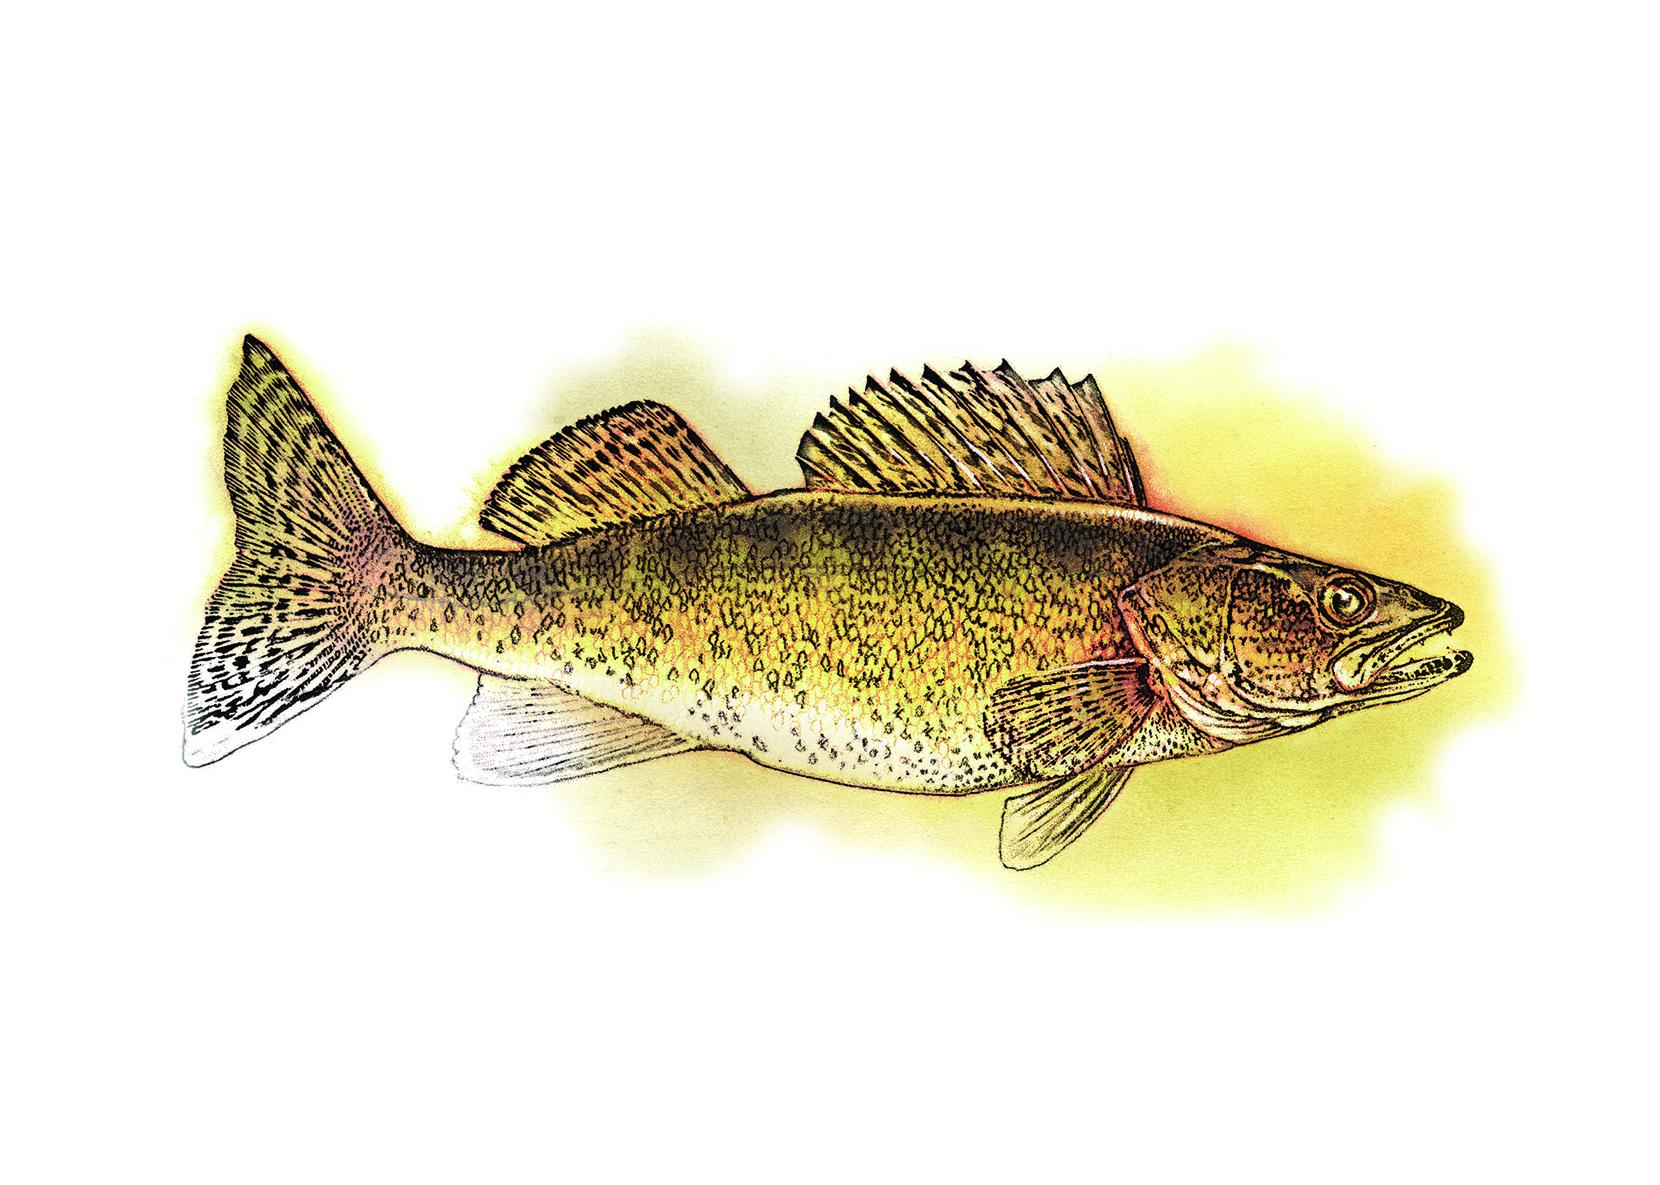 One Angler's Evolution